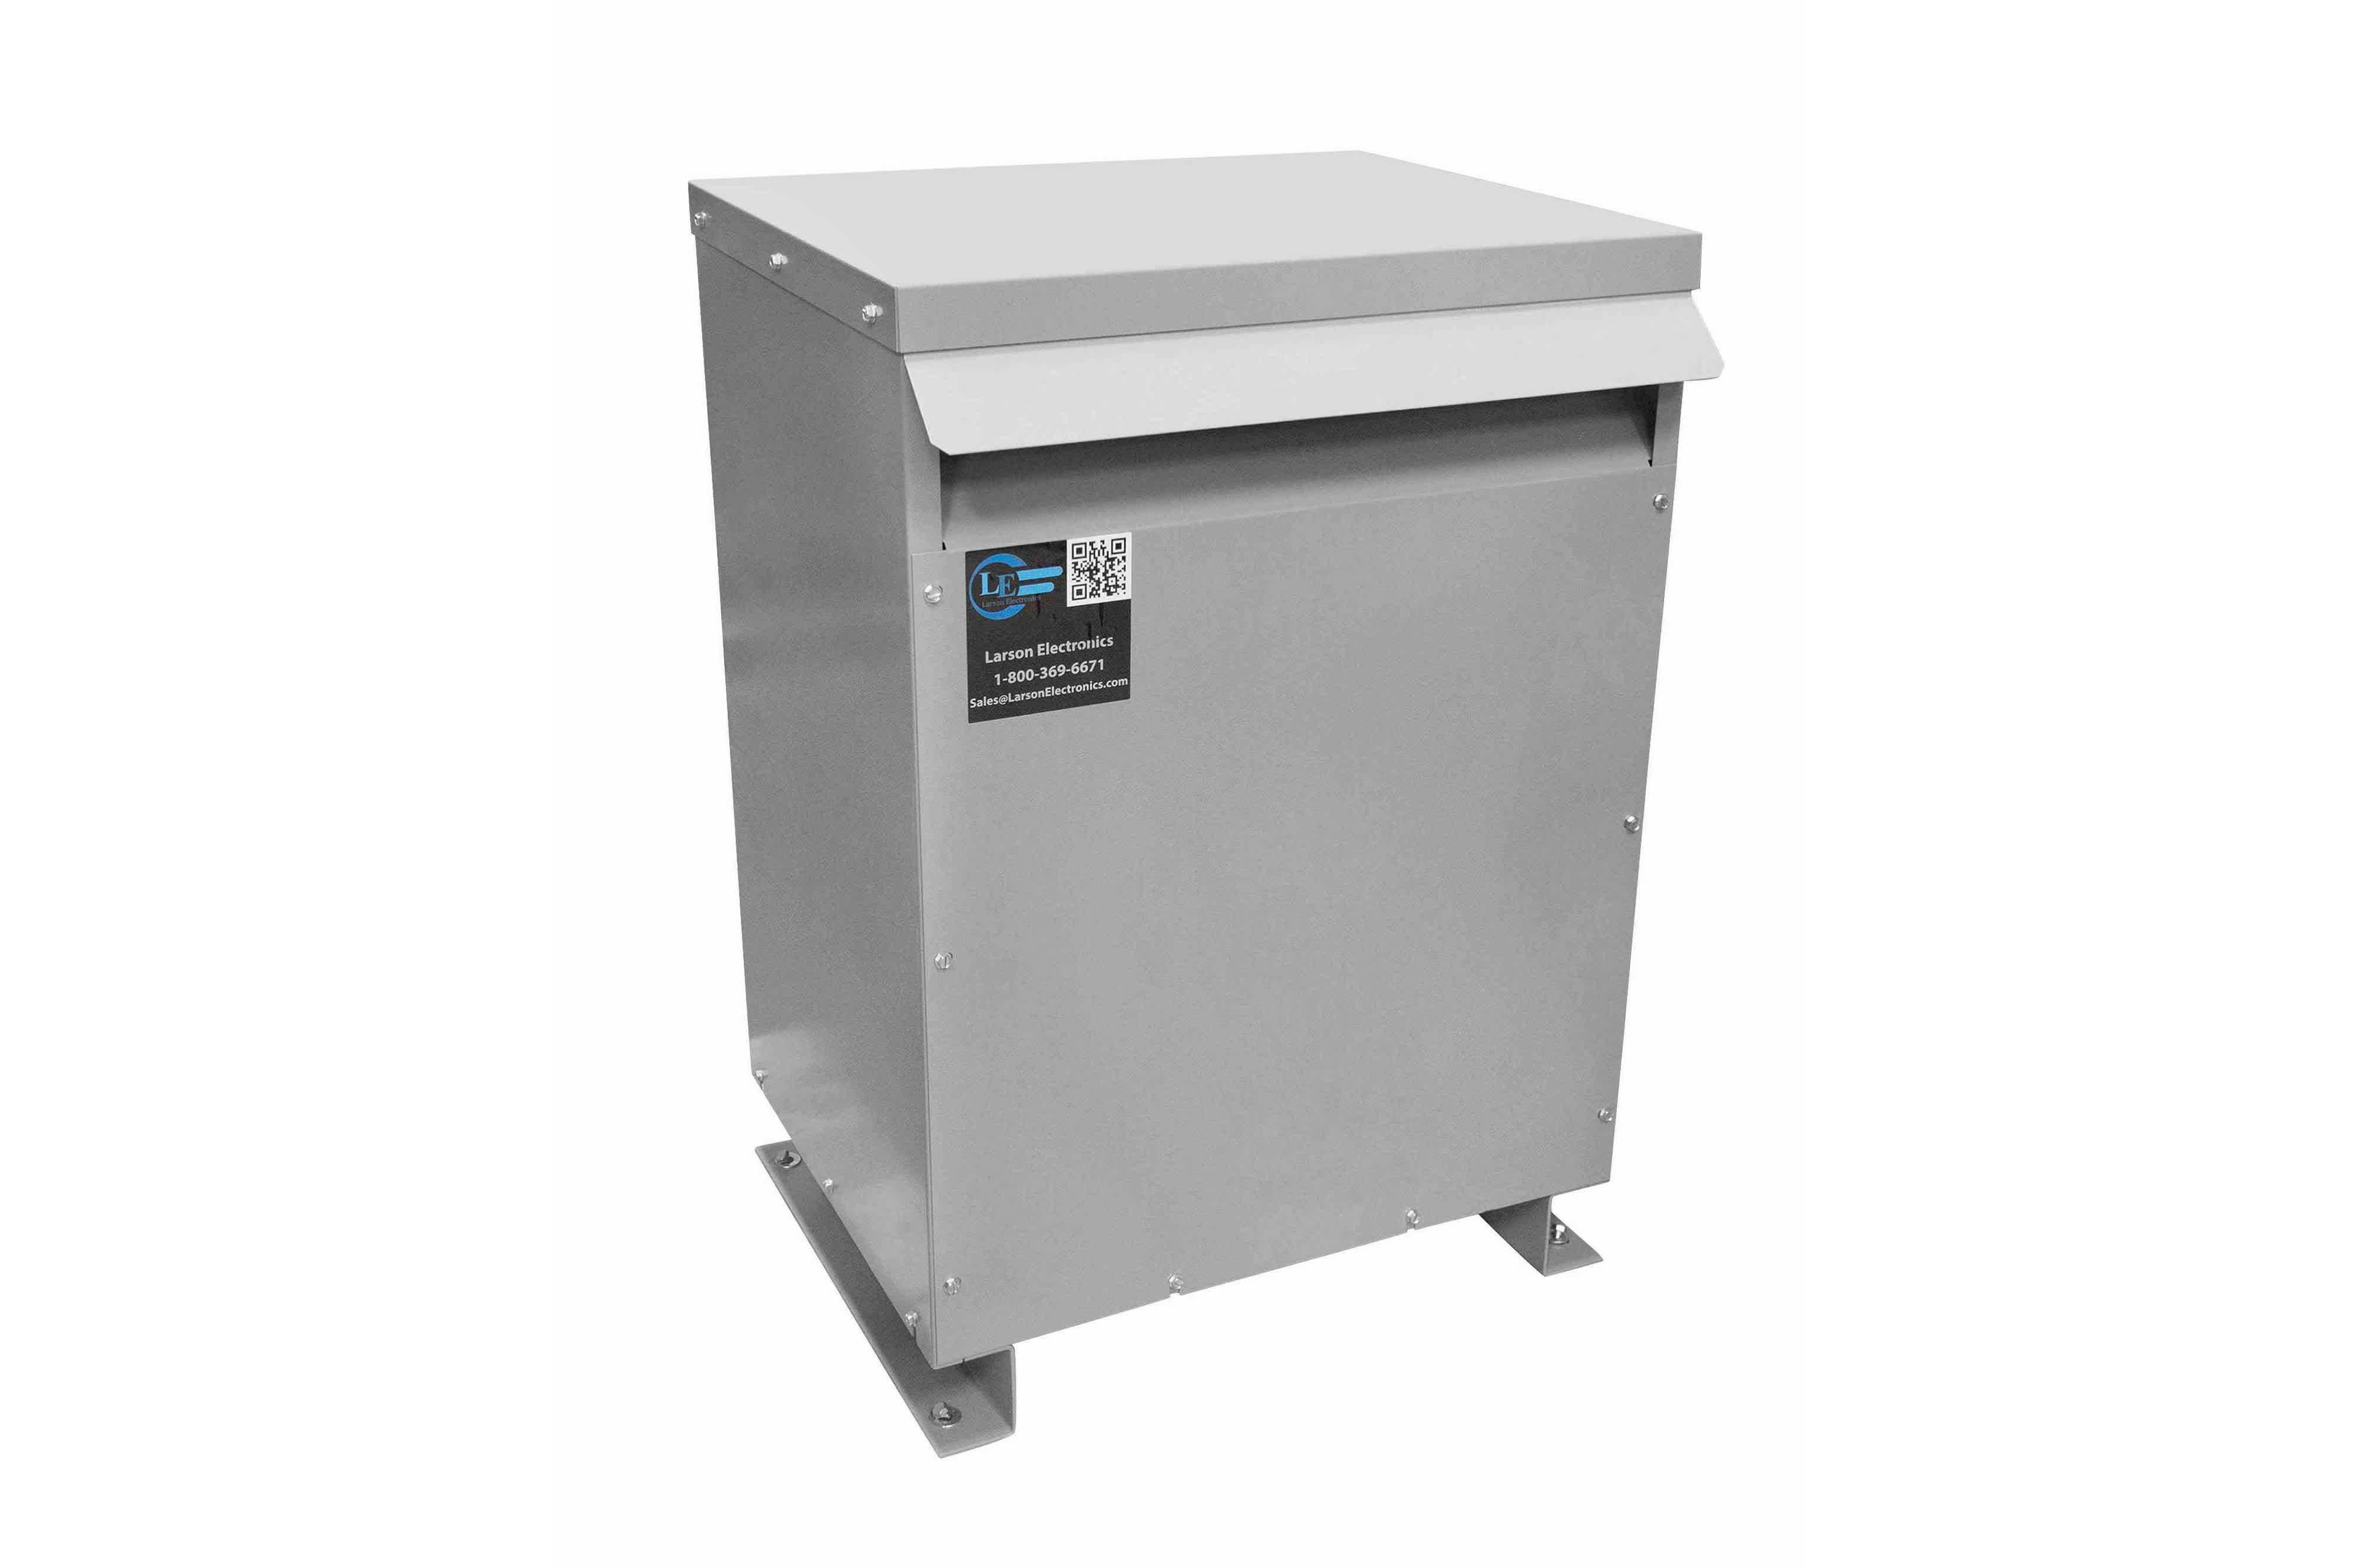 1000 kVA 3PH Isolation Transformer, 380V Wye Primary, 240V/120 Delta Secondary, N3R, Ventilated, 60 Hz